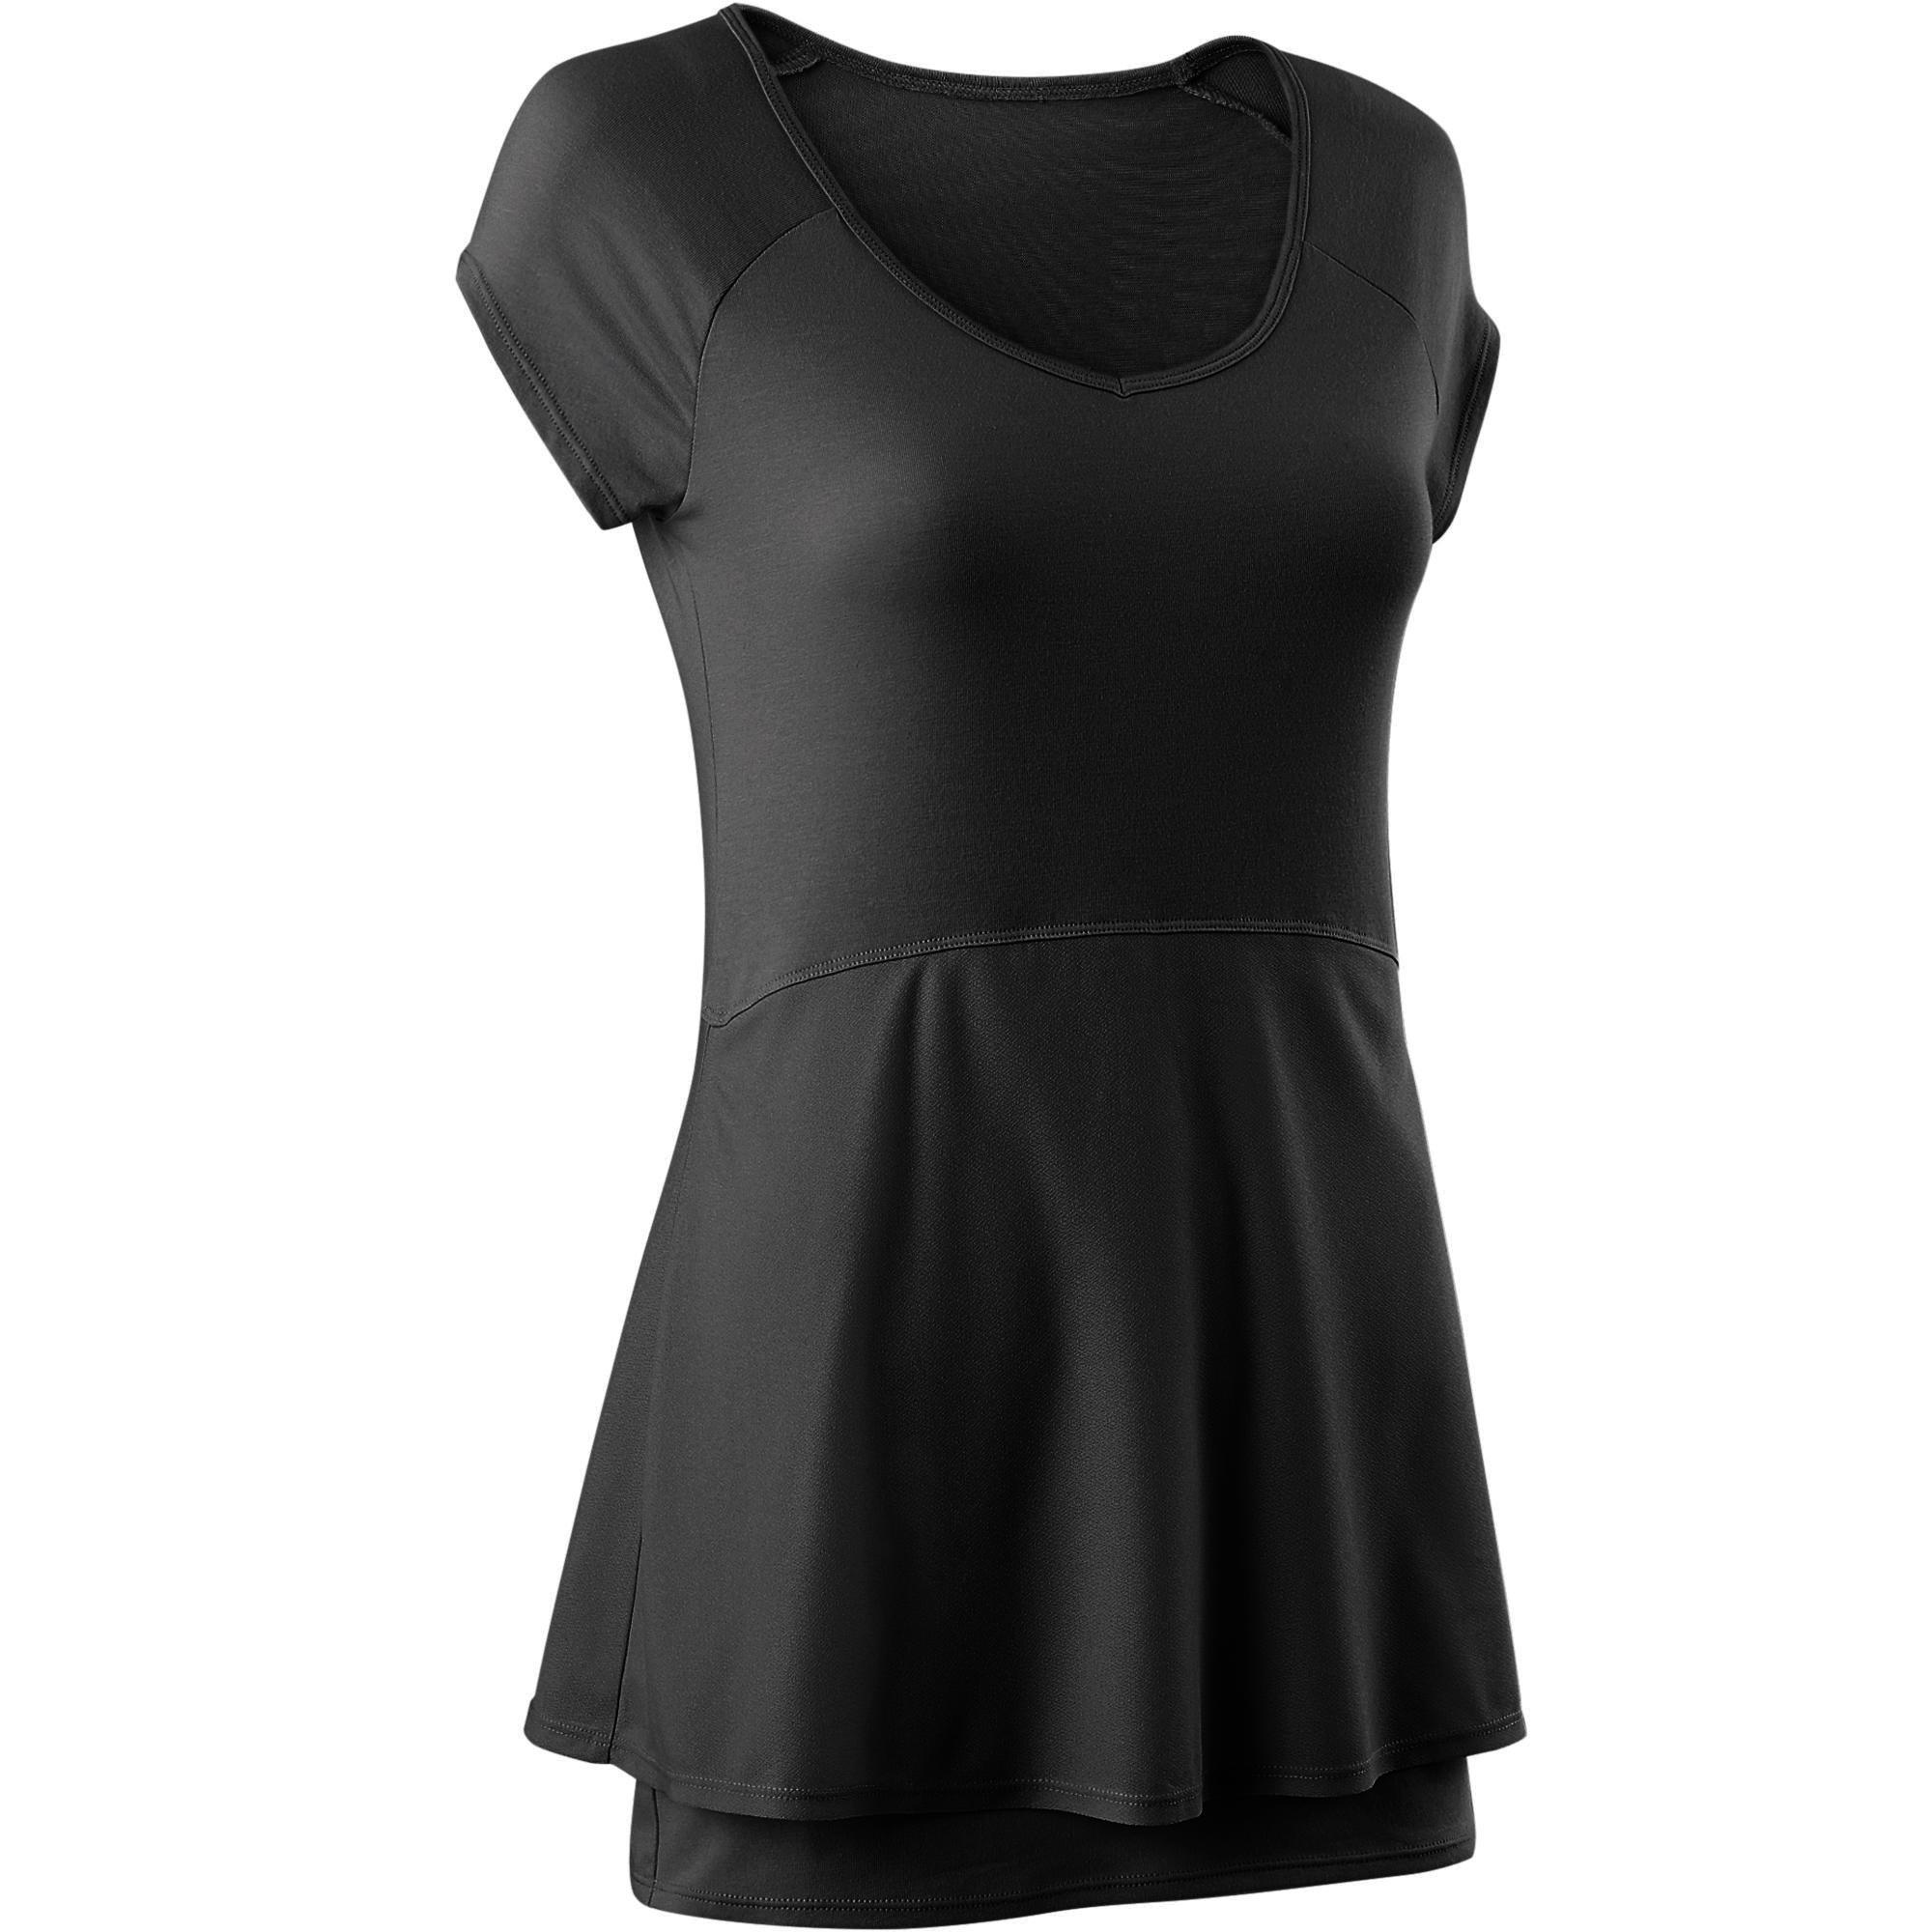 Camiseta 530 pilates y gimnasia suave mujer negro